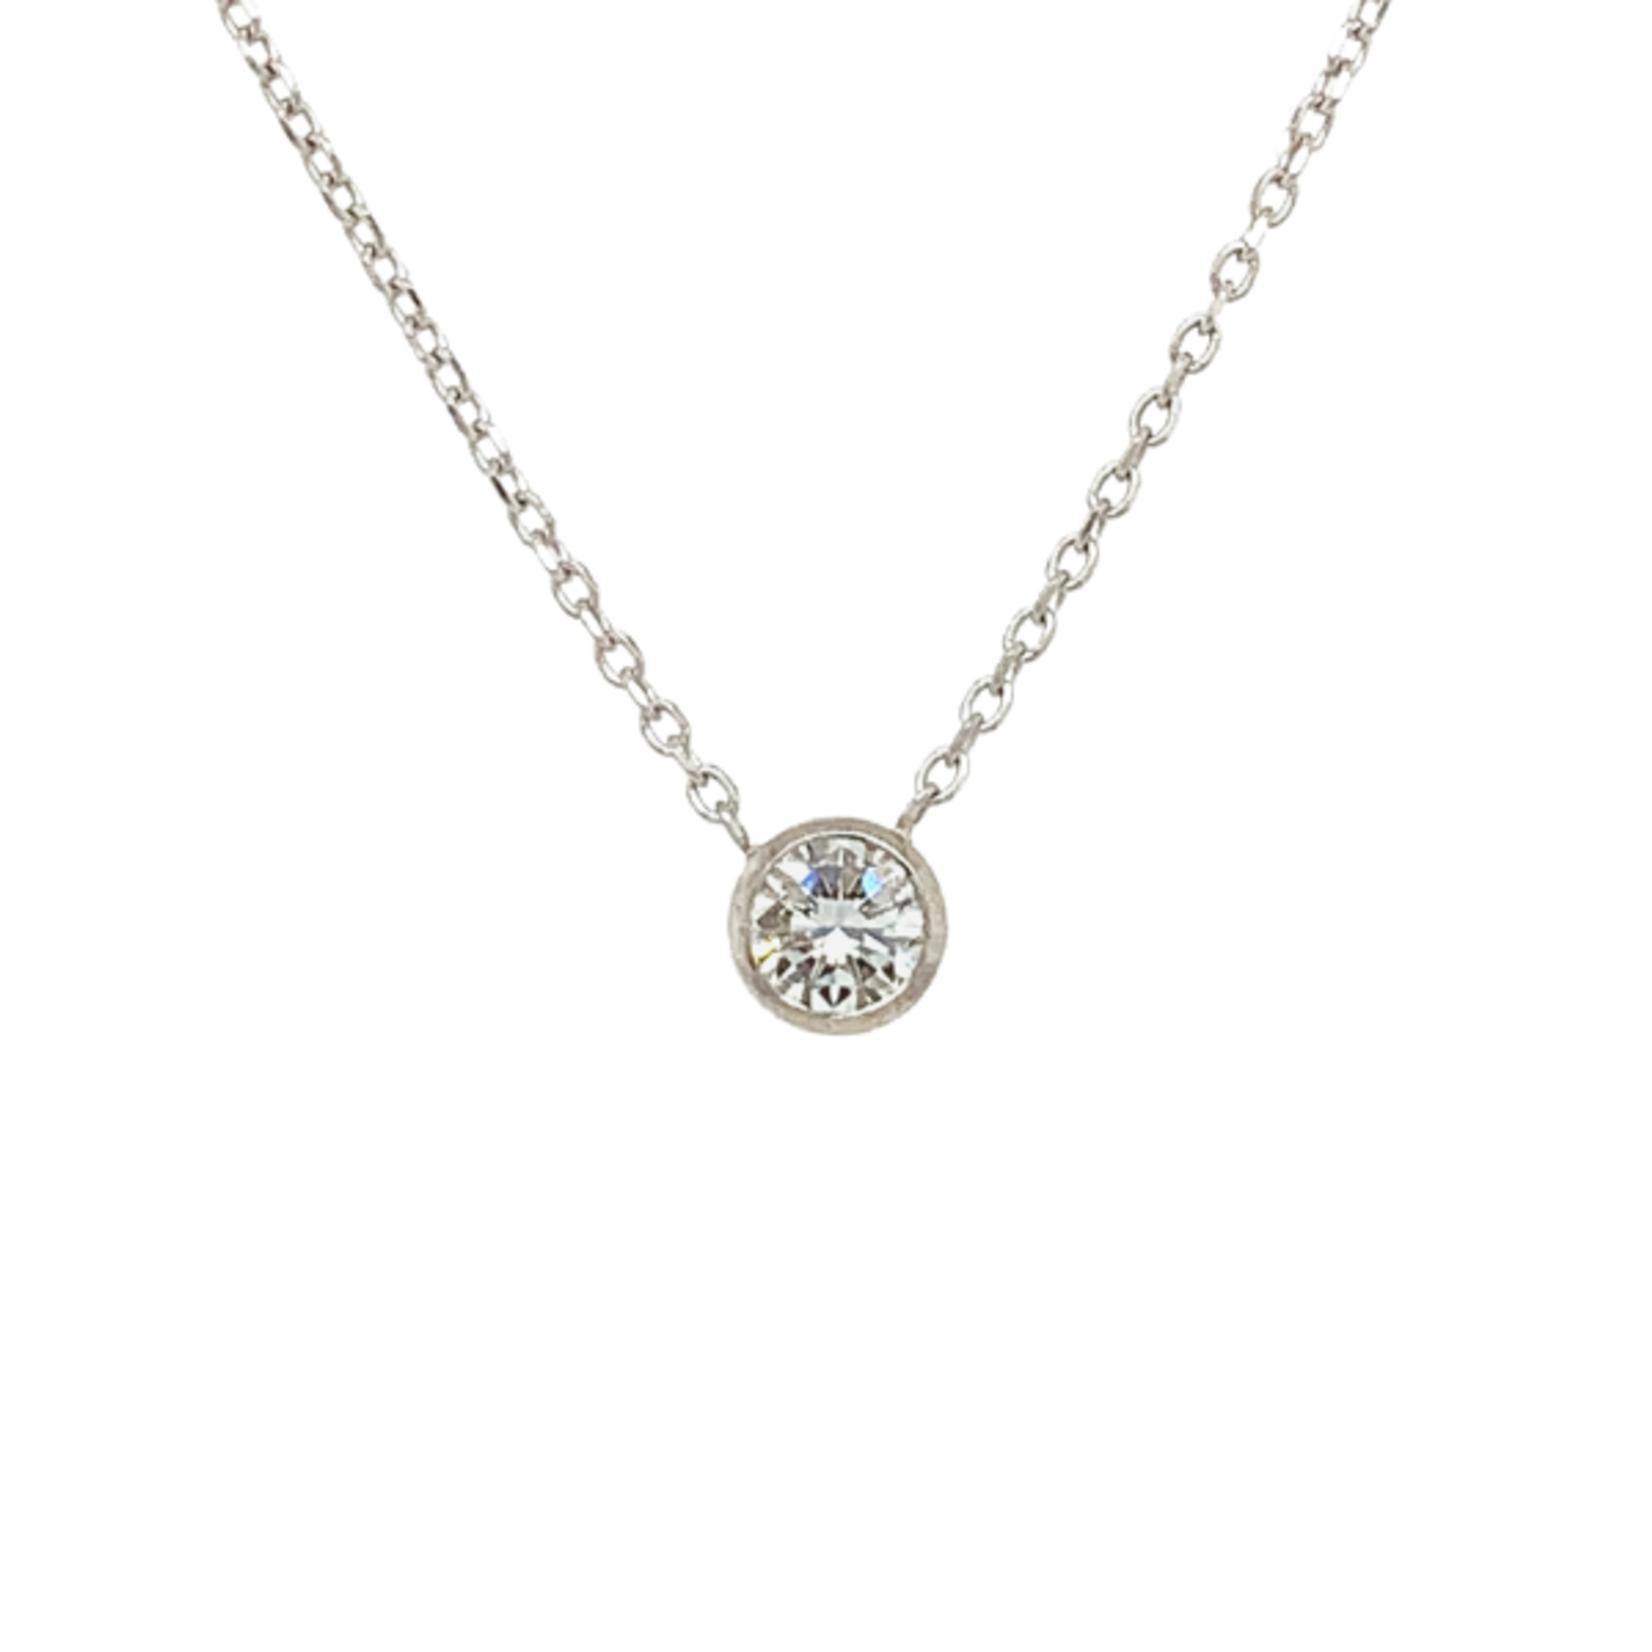 On The Edge Guiding Light  - .33 Diamond Necklace 14ktw - On The Edge